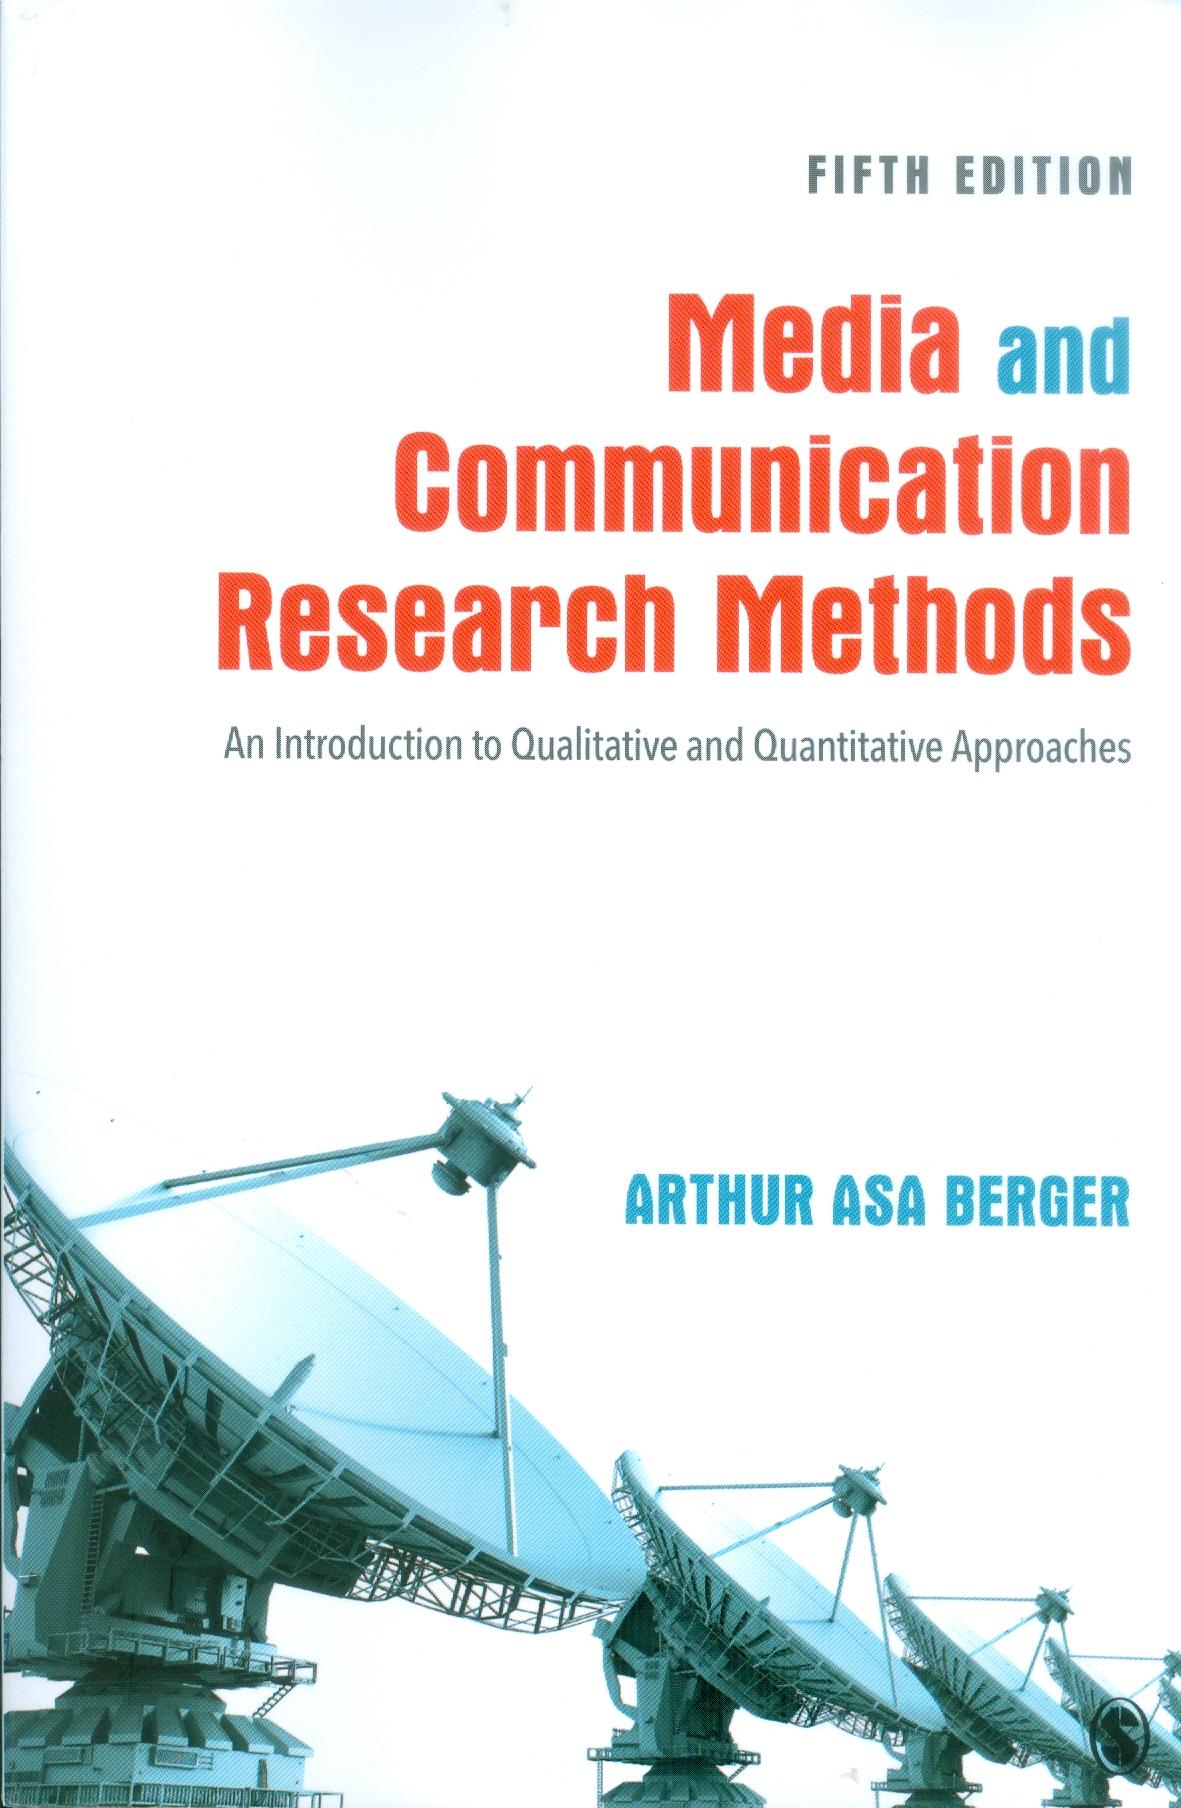 media and communication0001.jpg